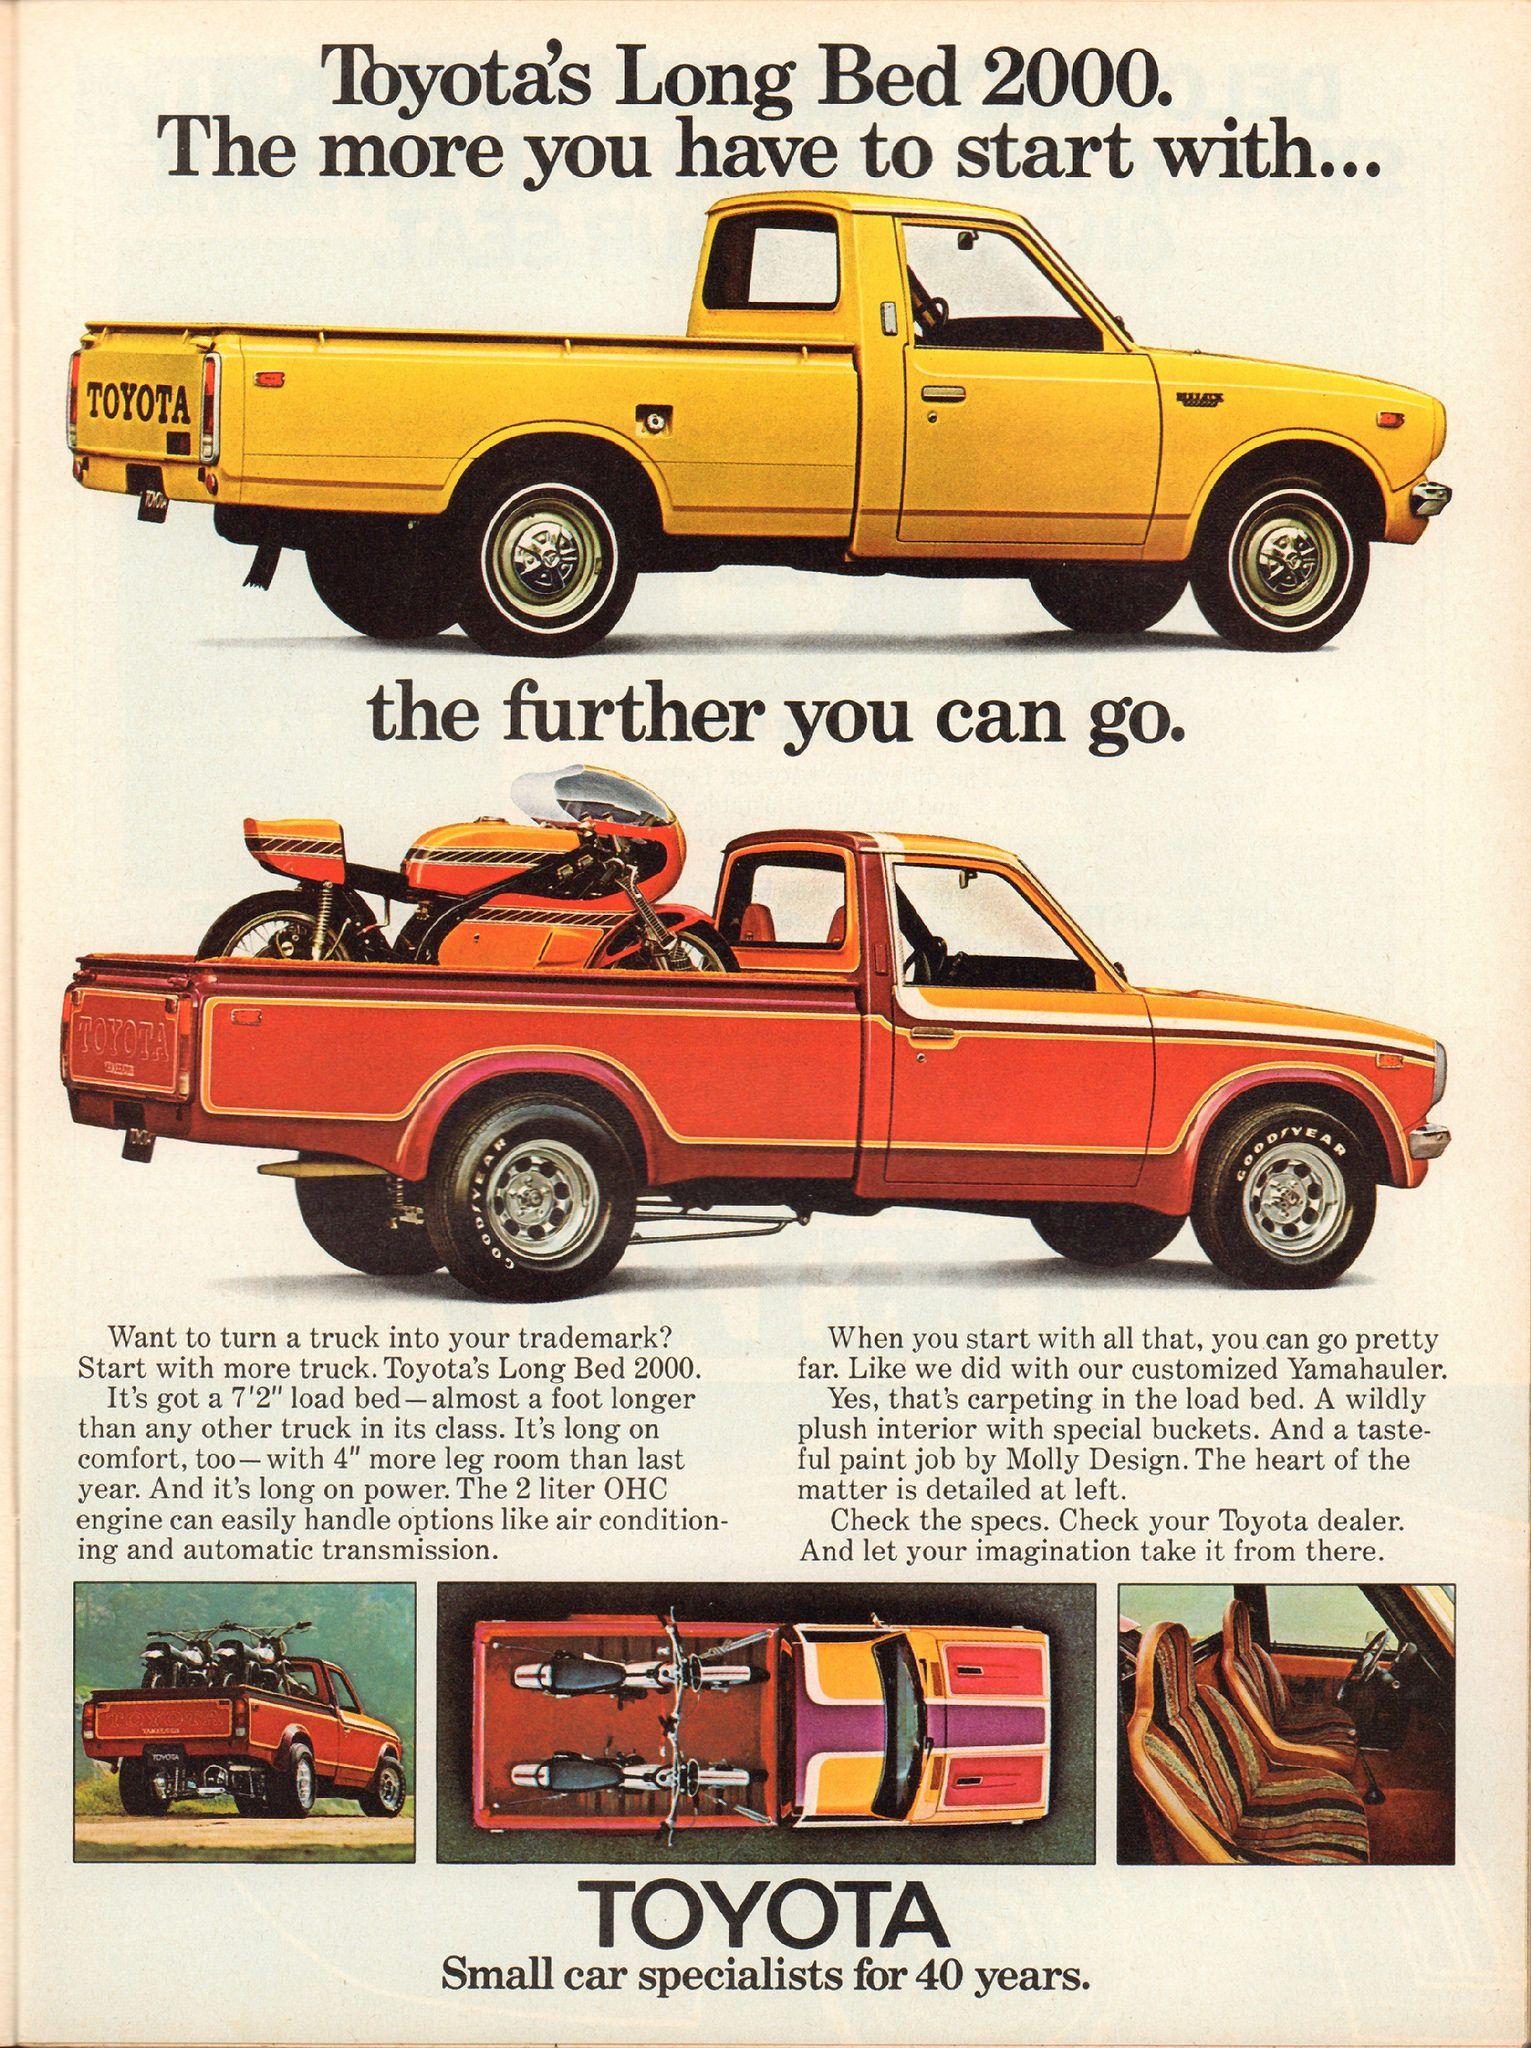 1974 Toyota Long Bed 2000 Pickup Truck Advertisement Motor Trend August 1974 Toyota Trucks Trucks Toyota